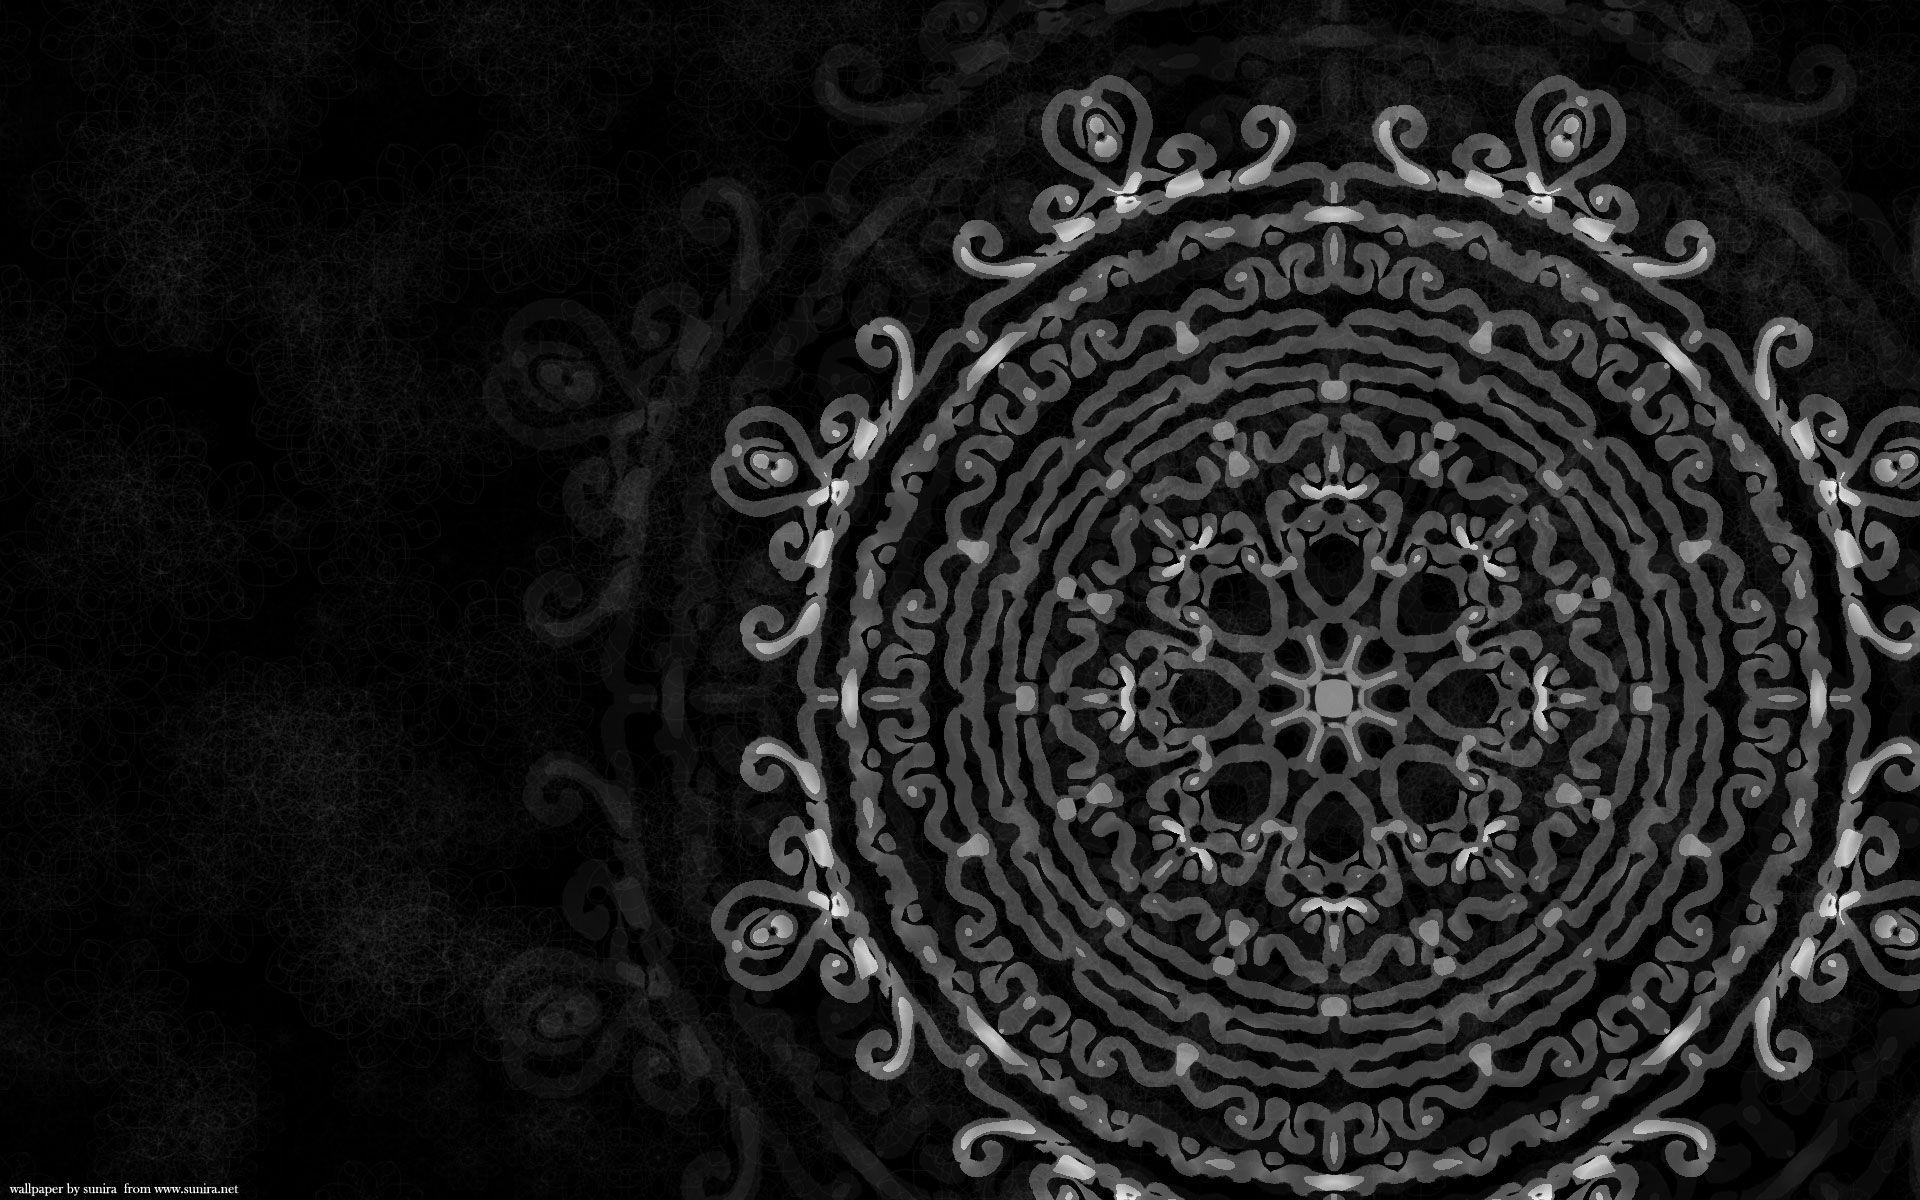 Indie Desktop Wallpapers - WallpaperSafari Tumblr Indie Backgrounds Black And White